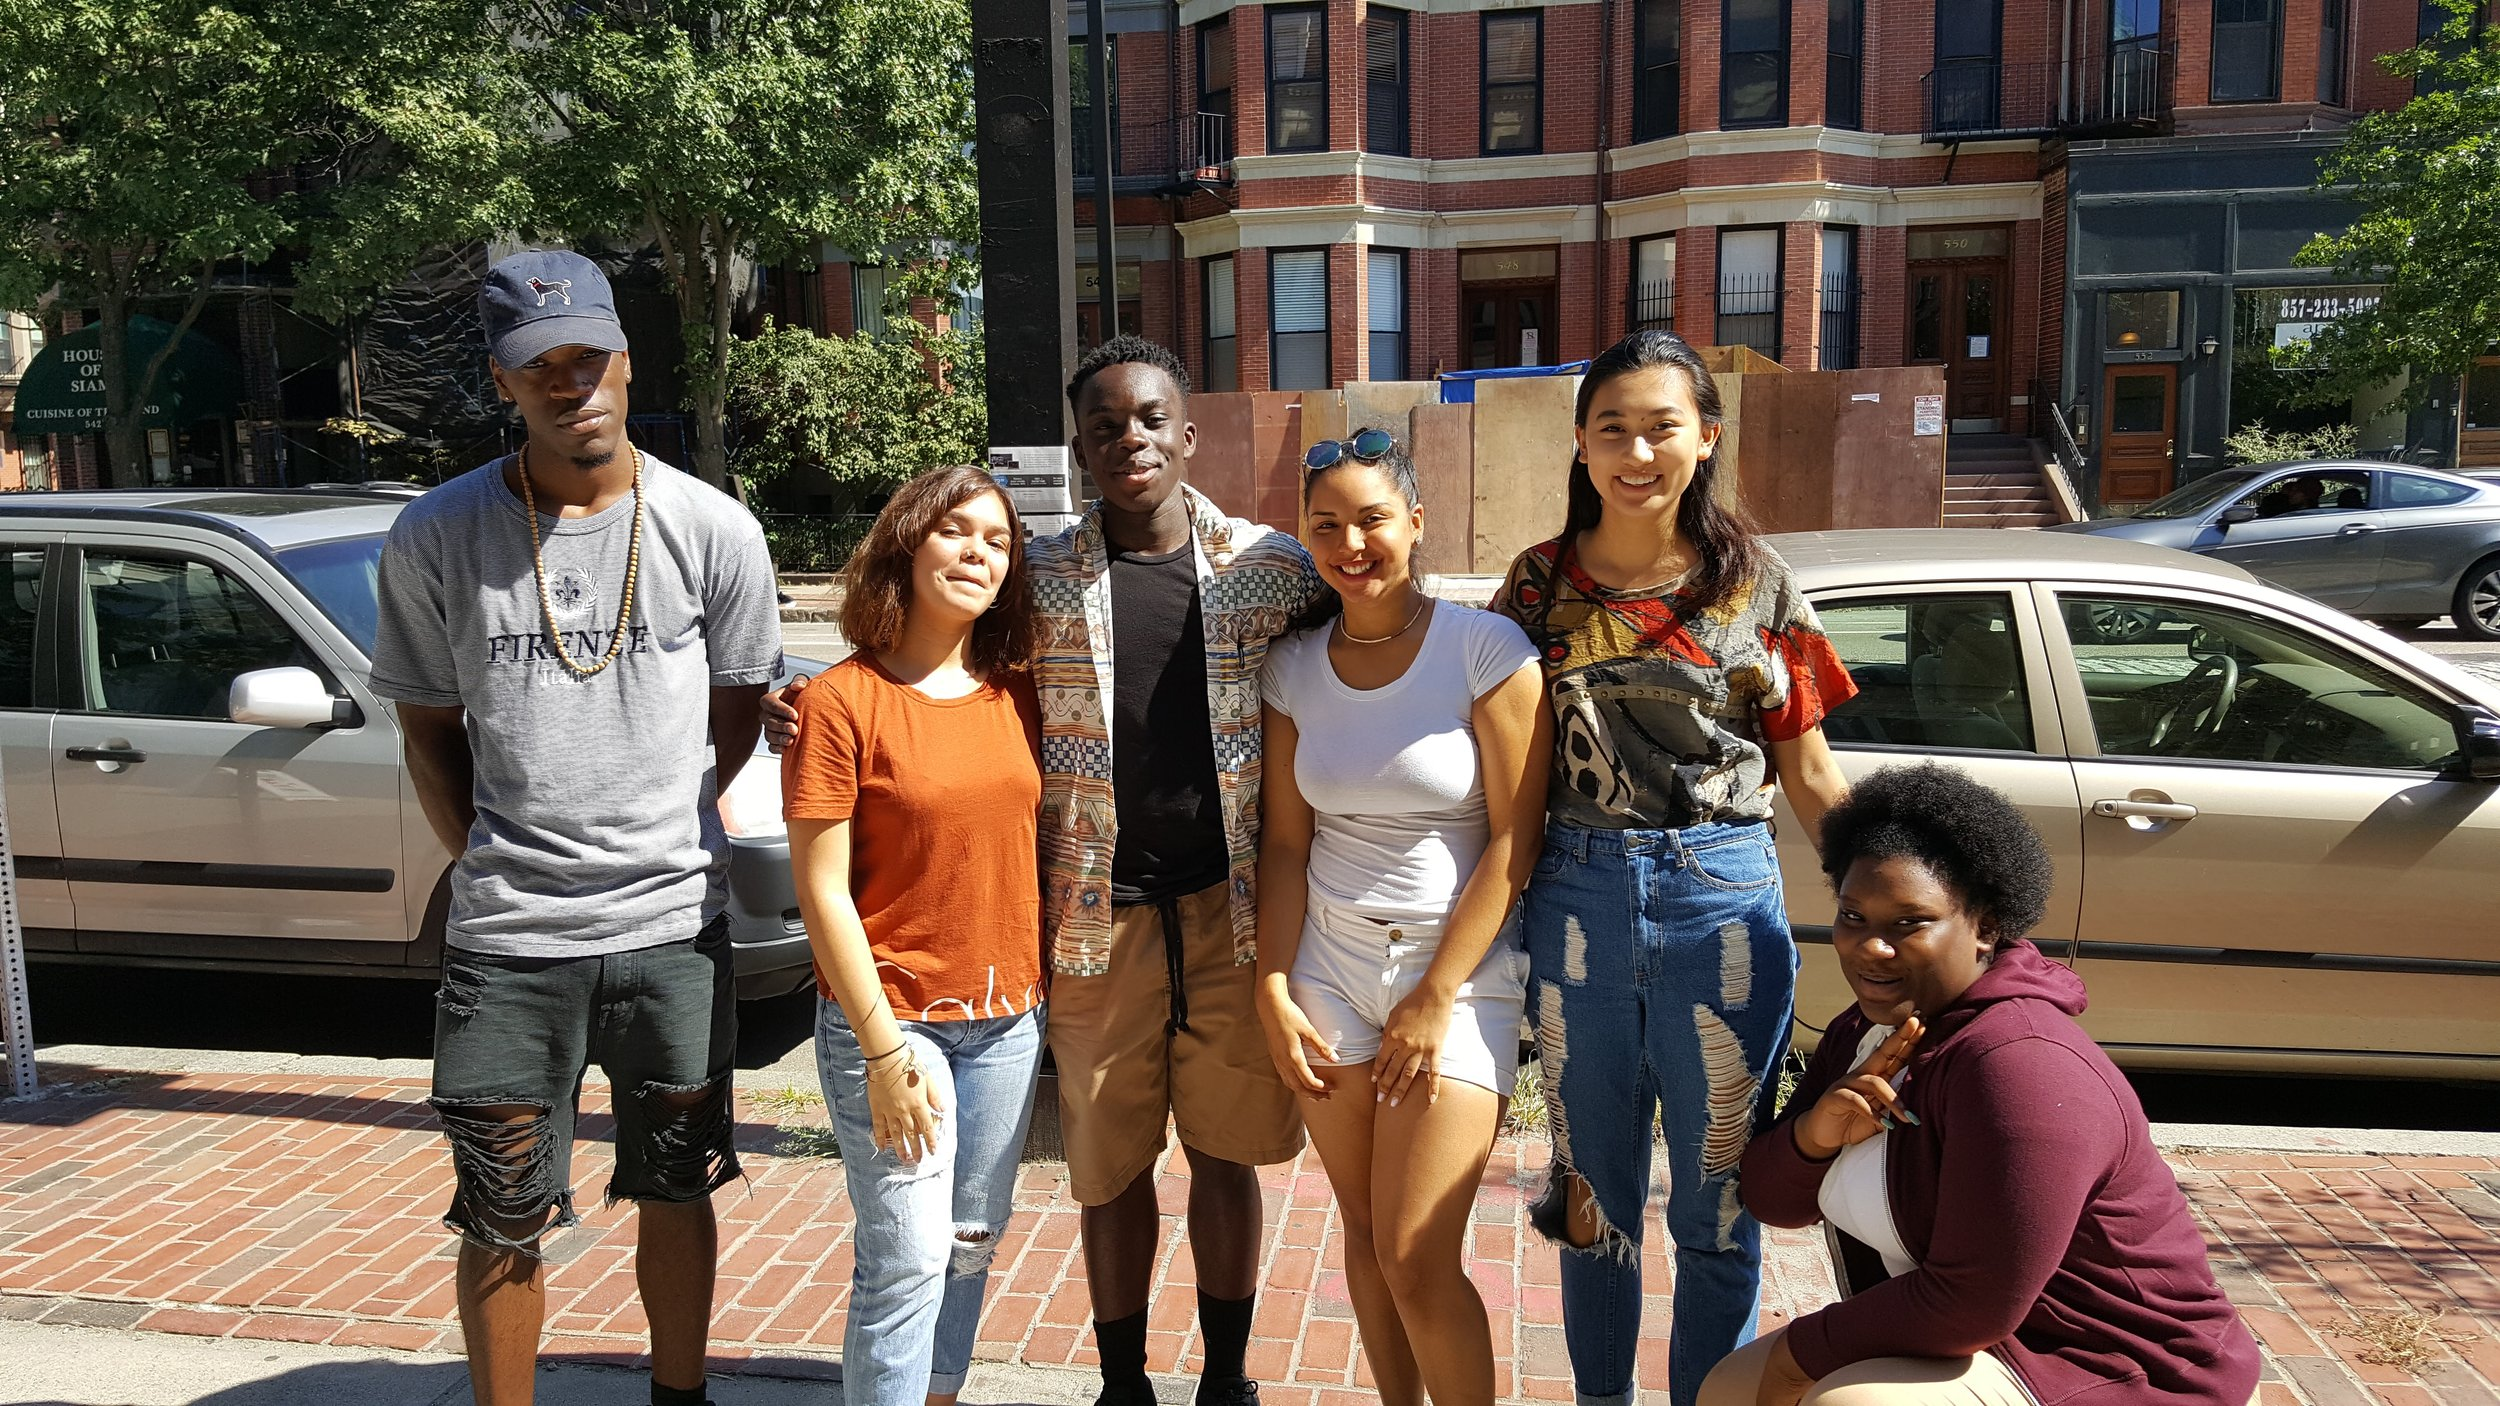 Members of the Youth Spoken Word Leaders Program (from left to right): Malcolm OIiver (19, Allston), Victoria DelValle (16, Boston South End), Kofi Dadzie (17, Westborough), Michelle Garcia (17, Lynn), Athena Chu (16, Brighton), Andrine Pierresant (14, Cambridge)